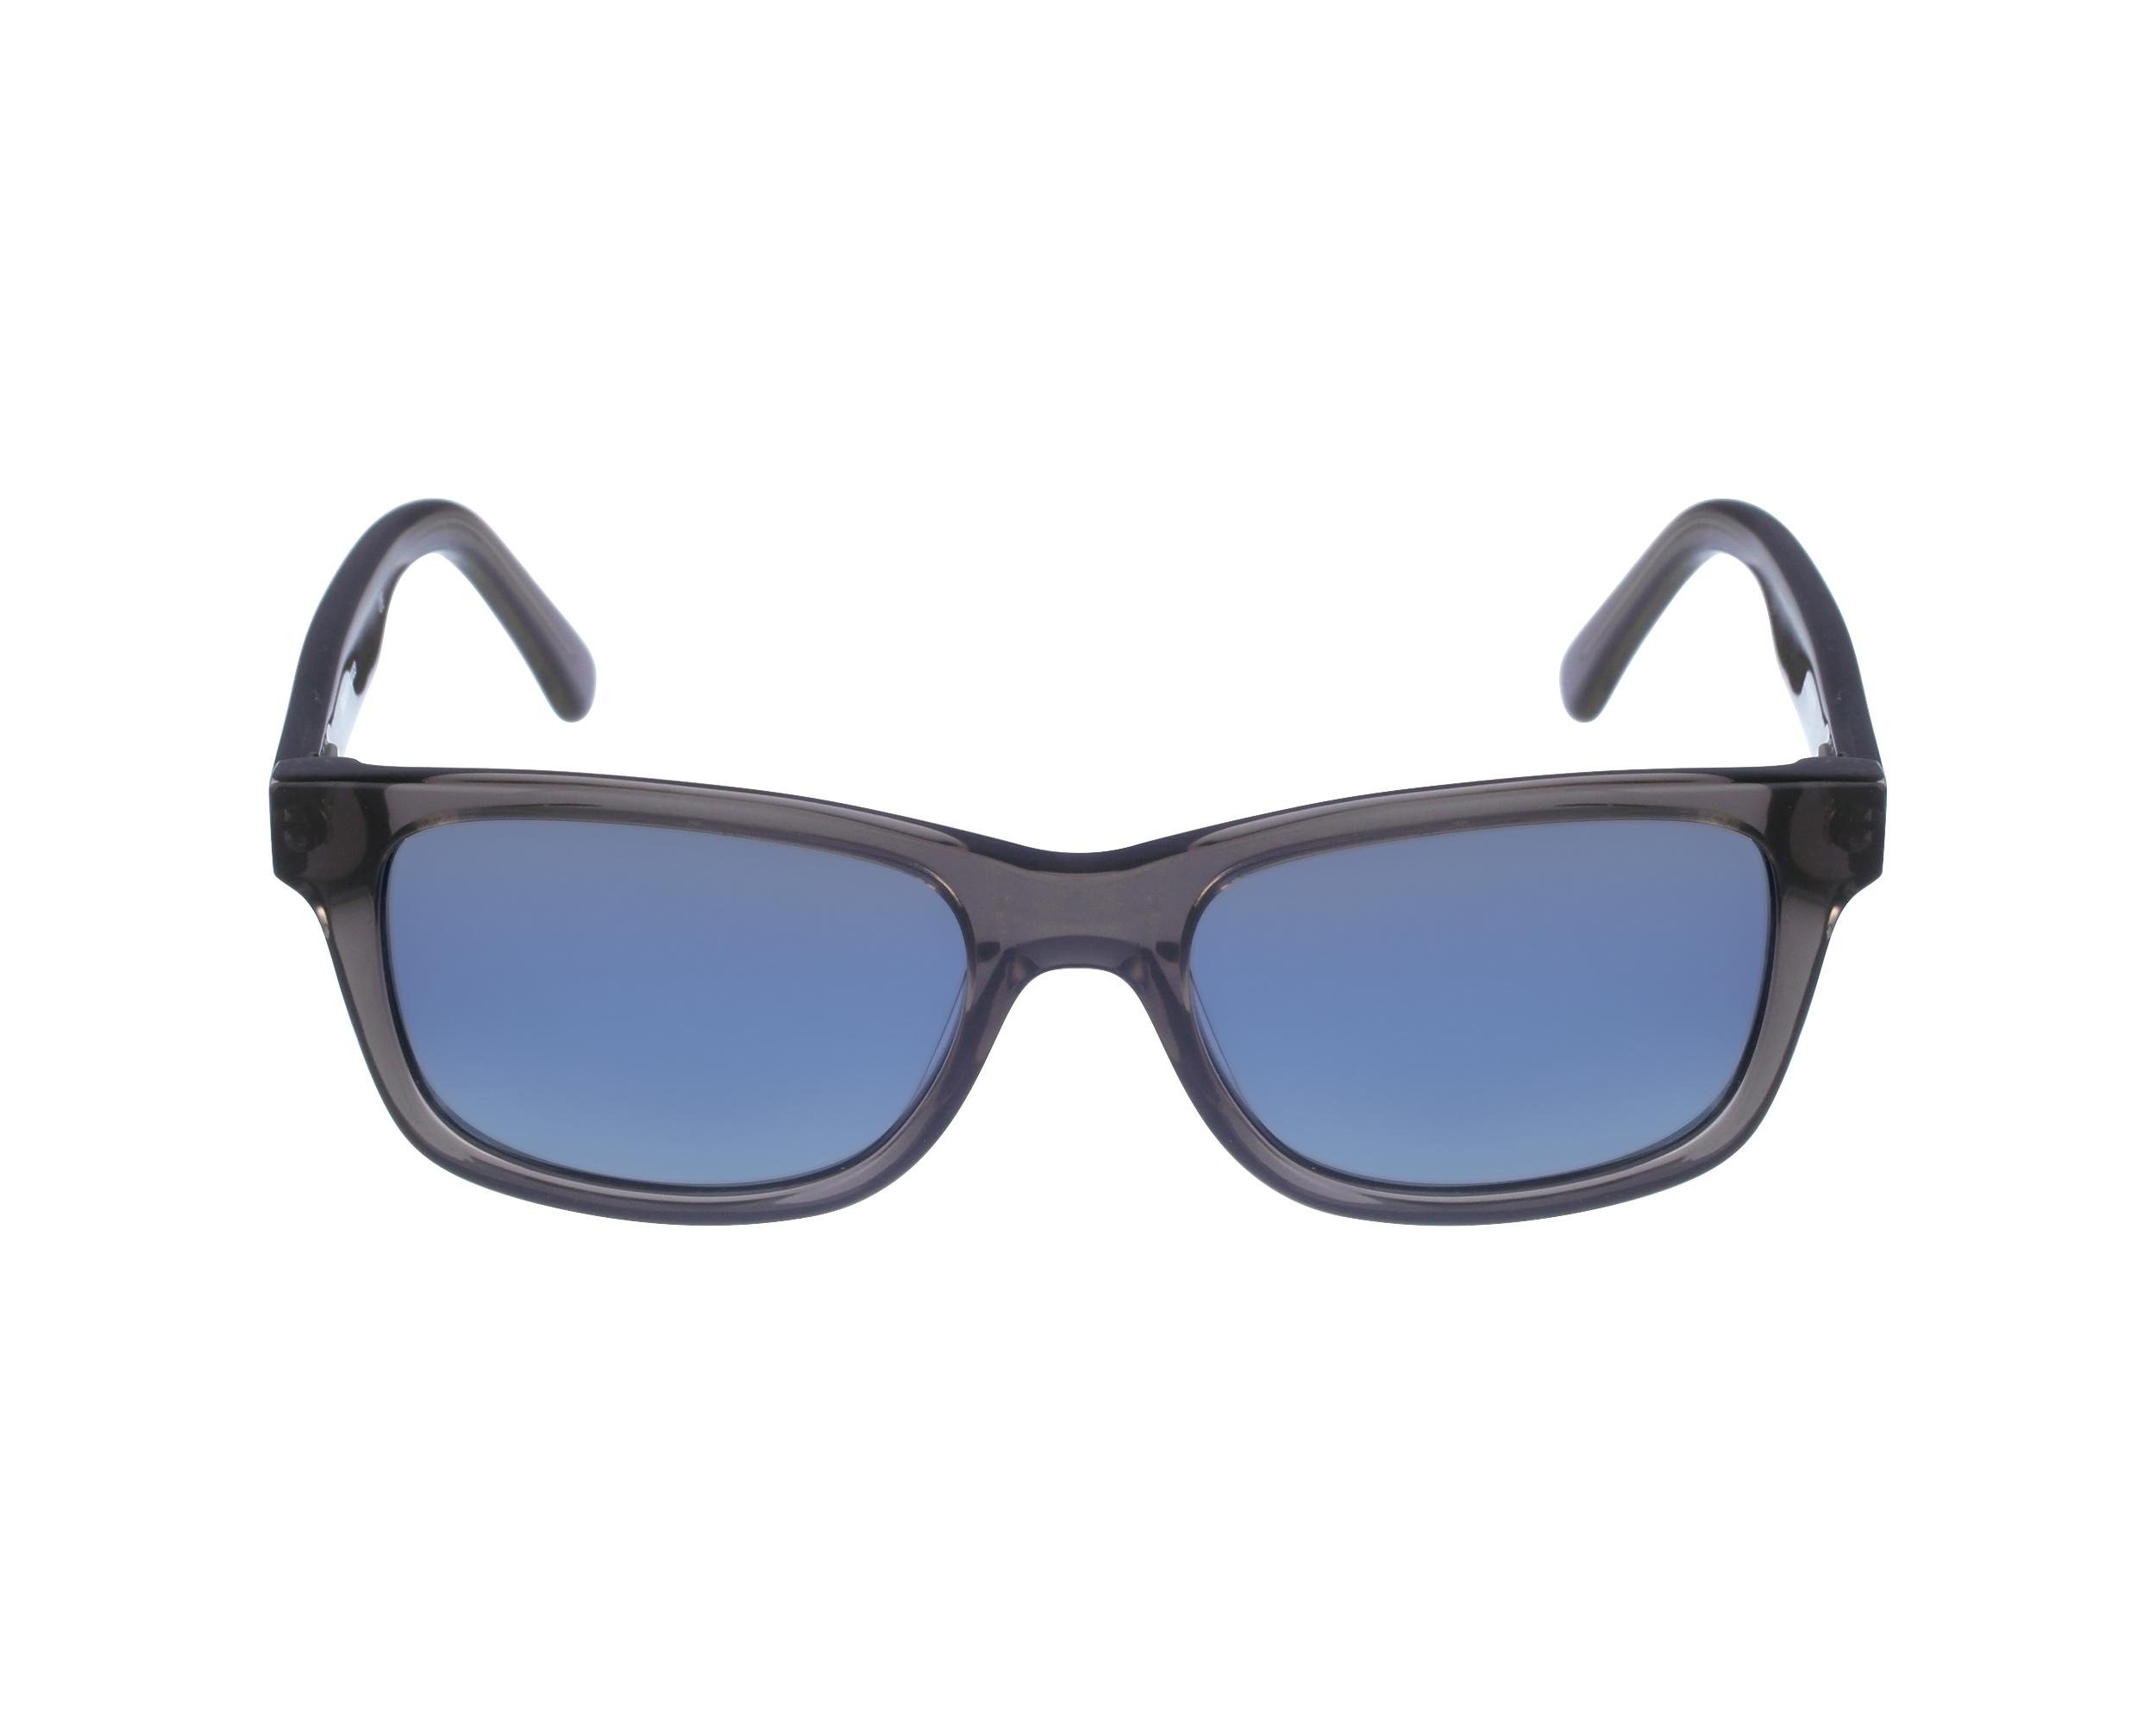 Vuarnet Sunglasses Nz  vuarnet sunglasses vl 1303 0002 53 visionet